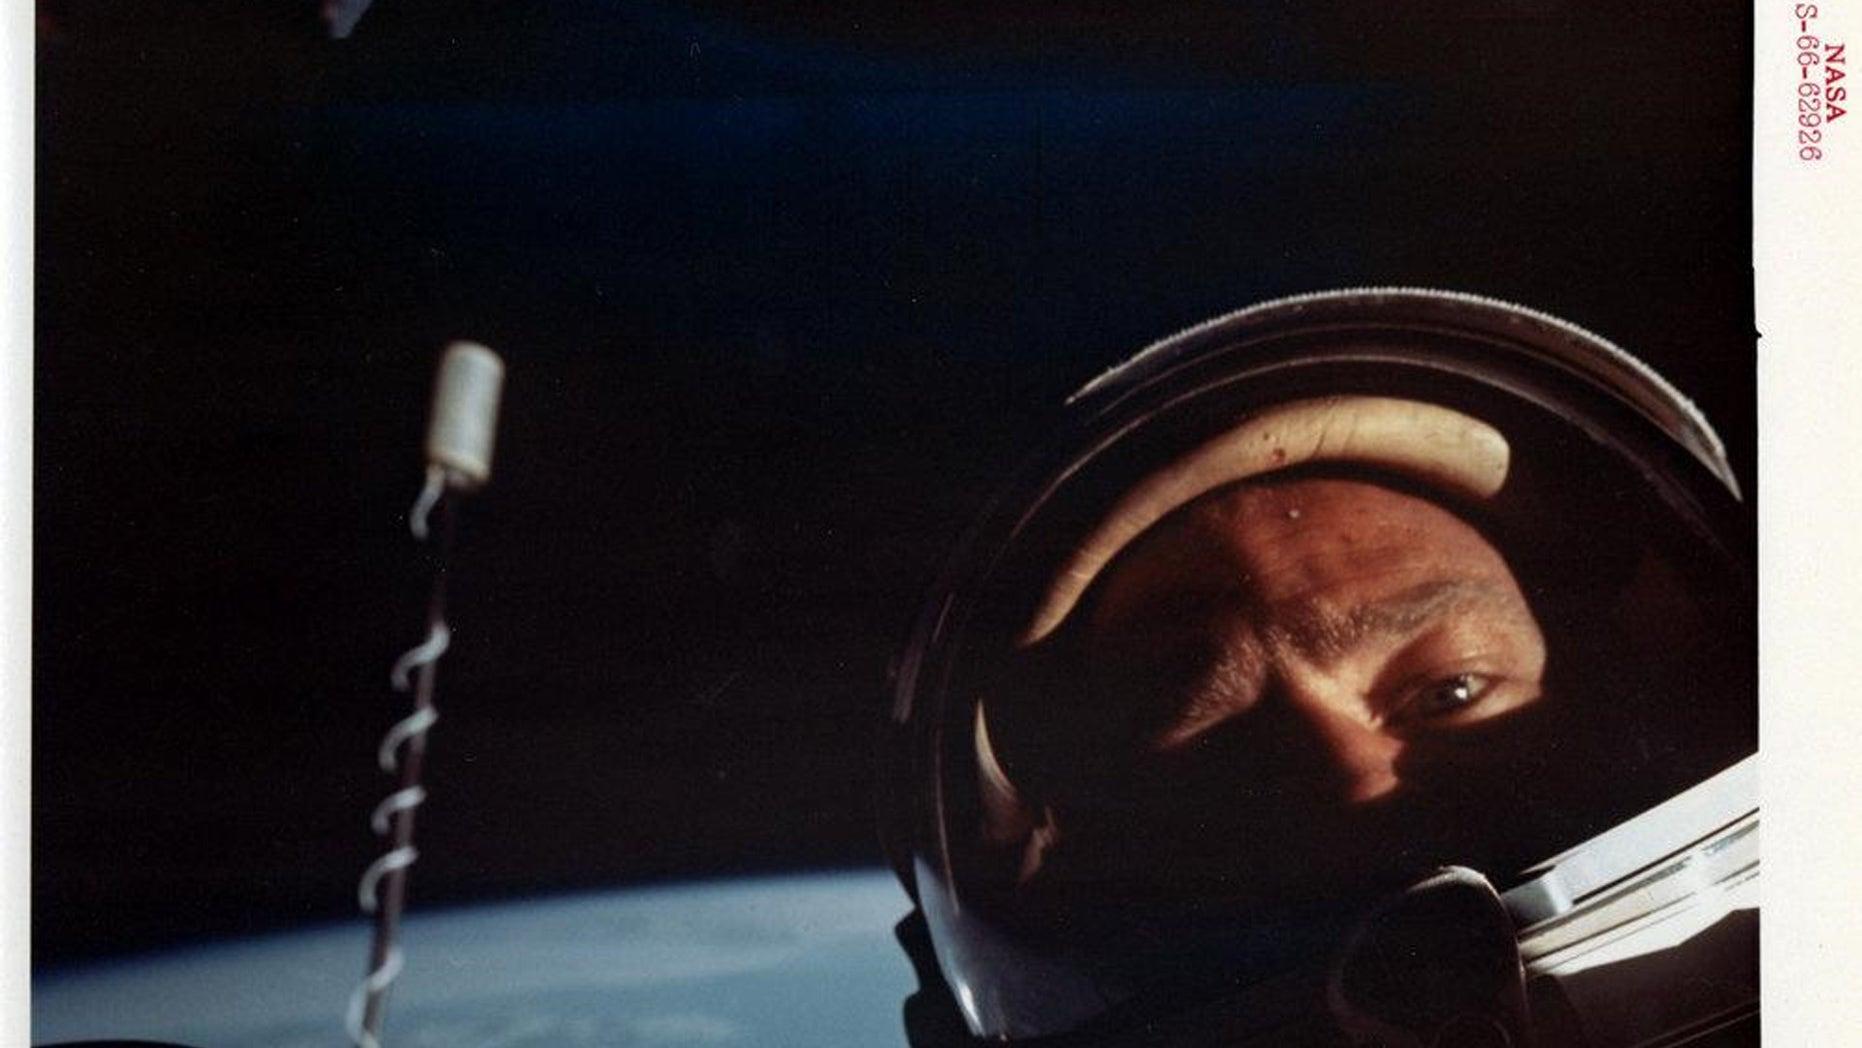 (Credit: Buzz Aldrin, NASA, Bloomsbury Auction)